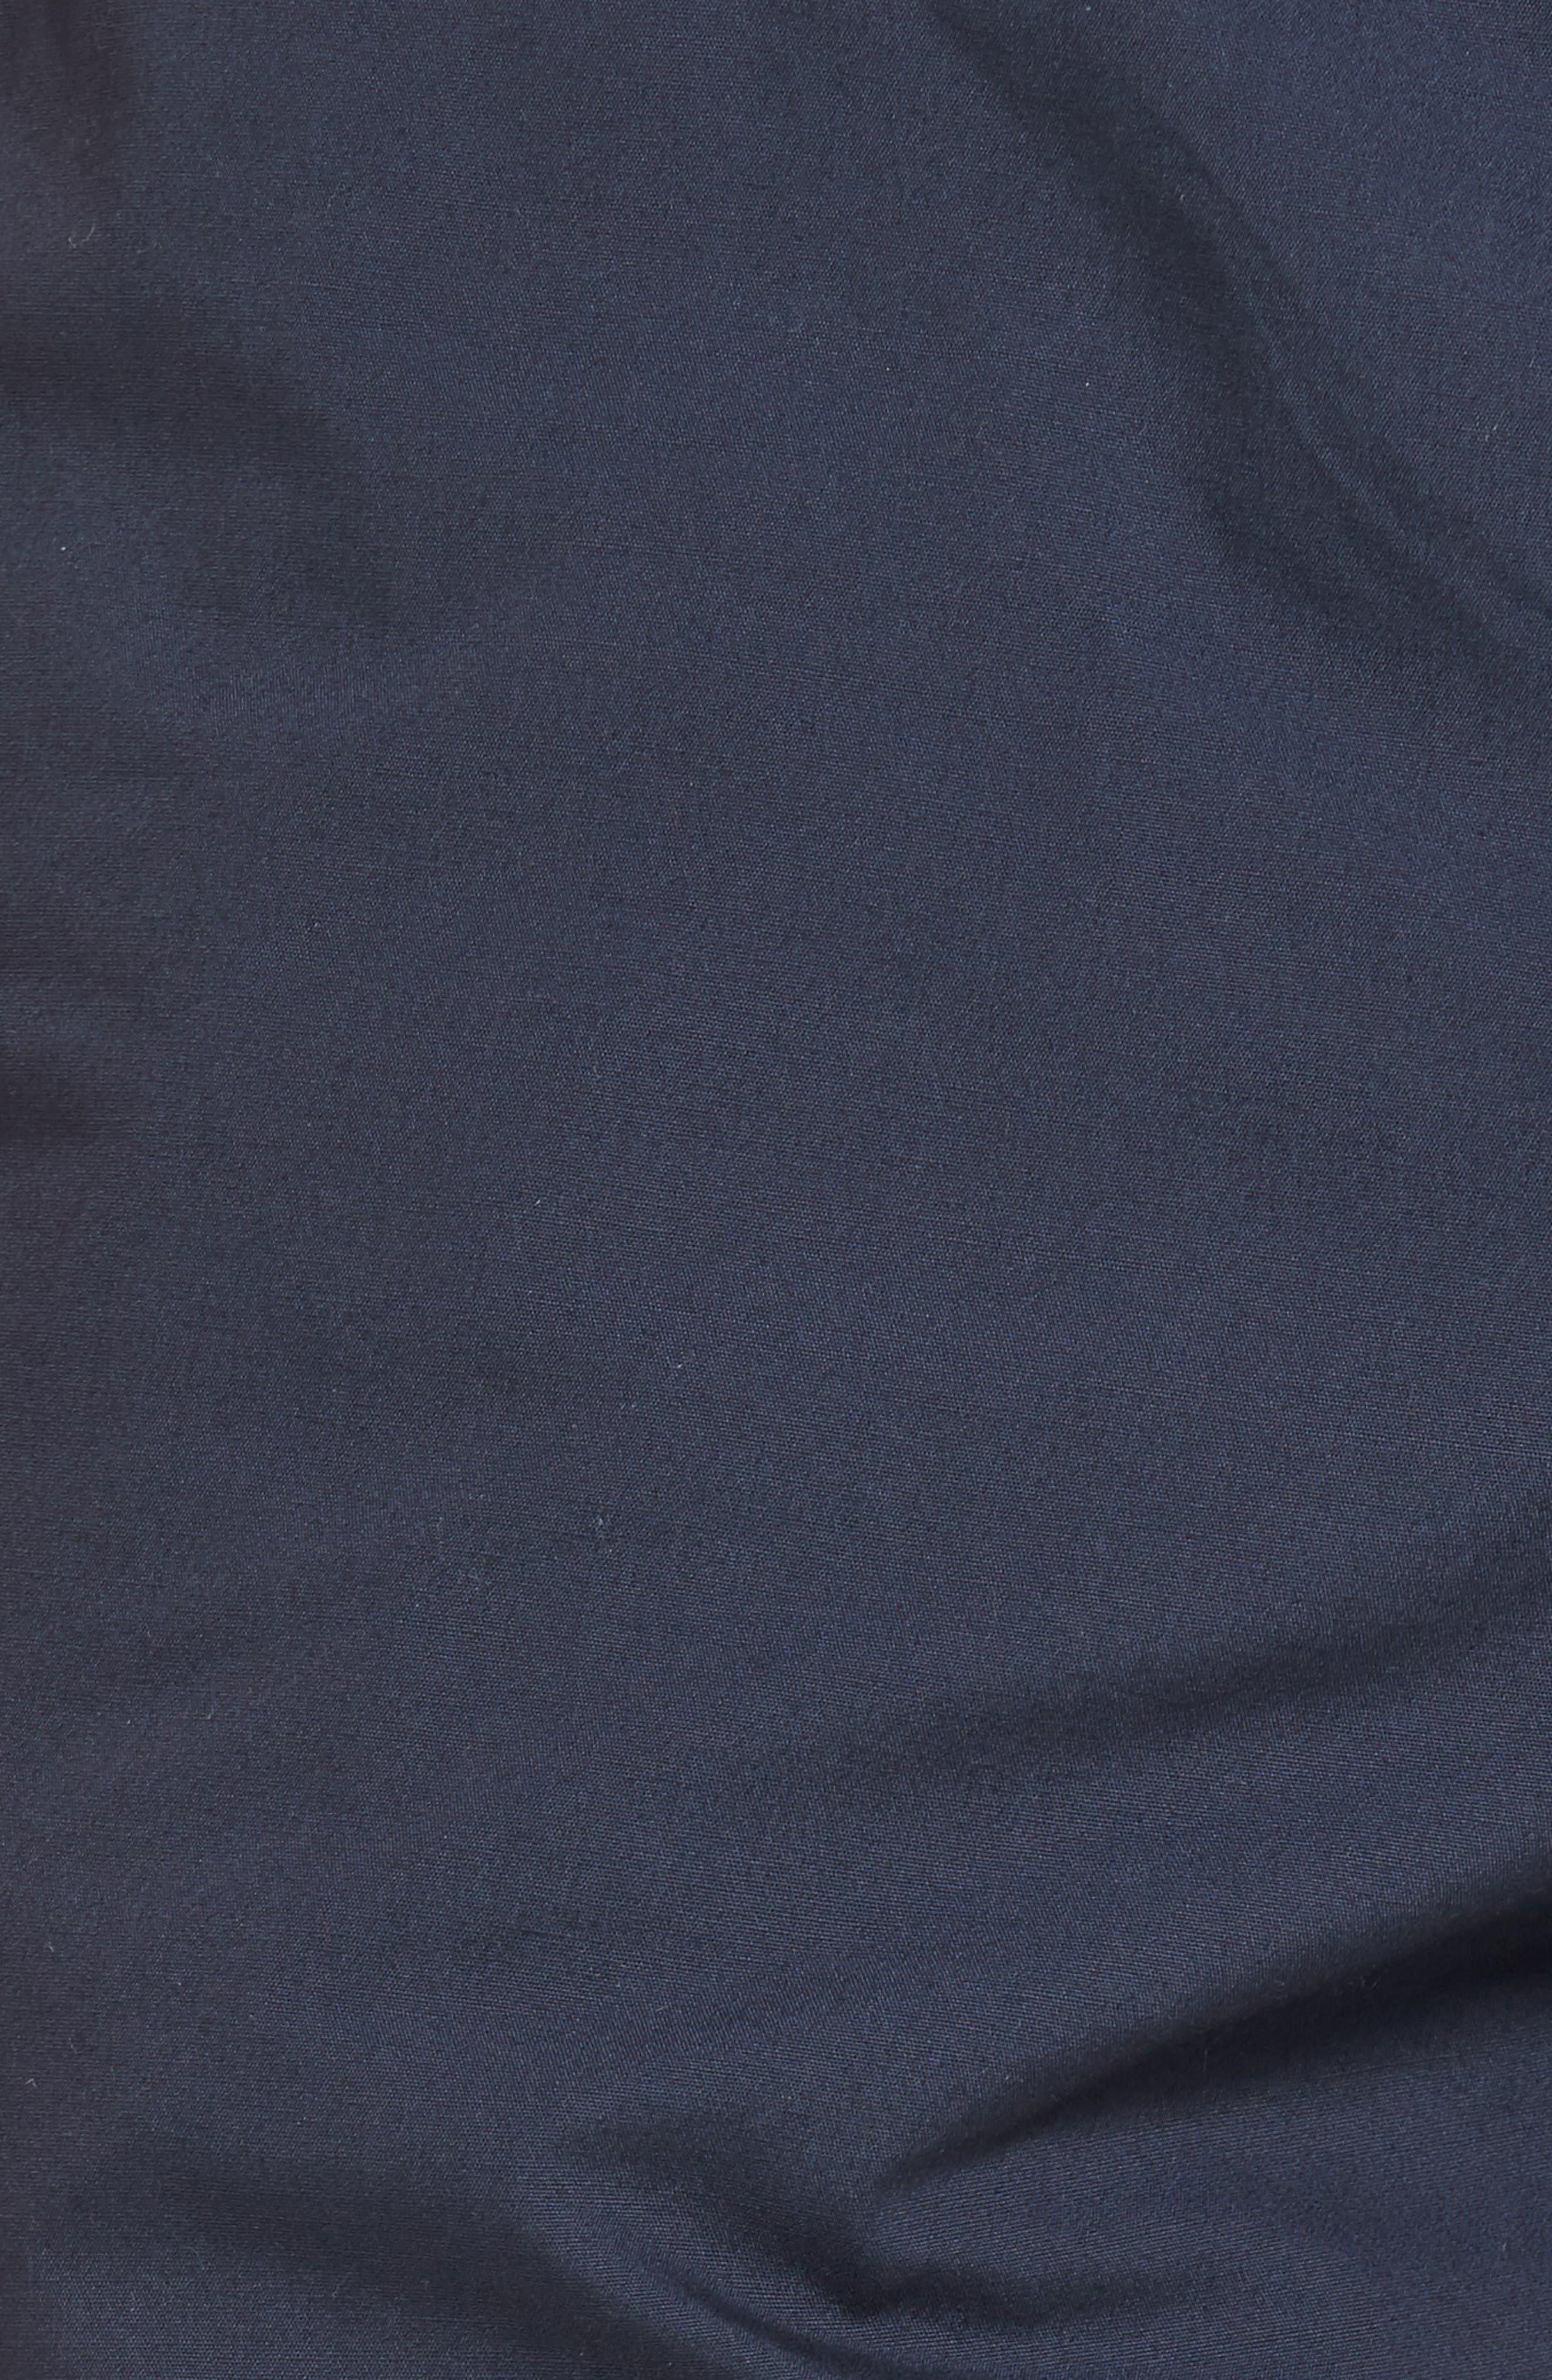 Reversible Walking Shorts,                             Alternate thumbnail 5, color,                             Navy/ Seersucker/ Navy